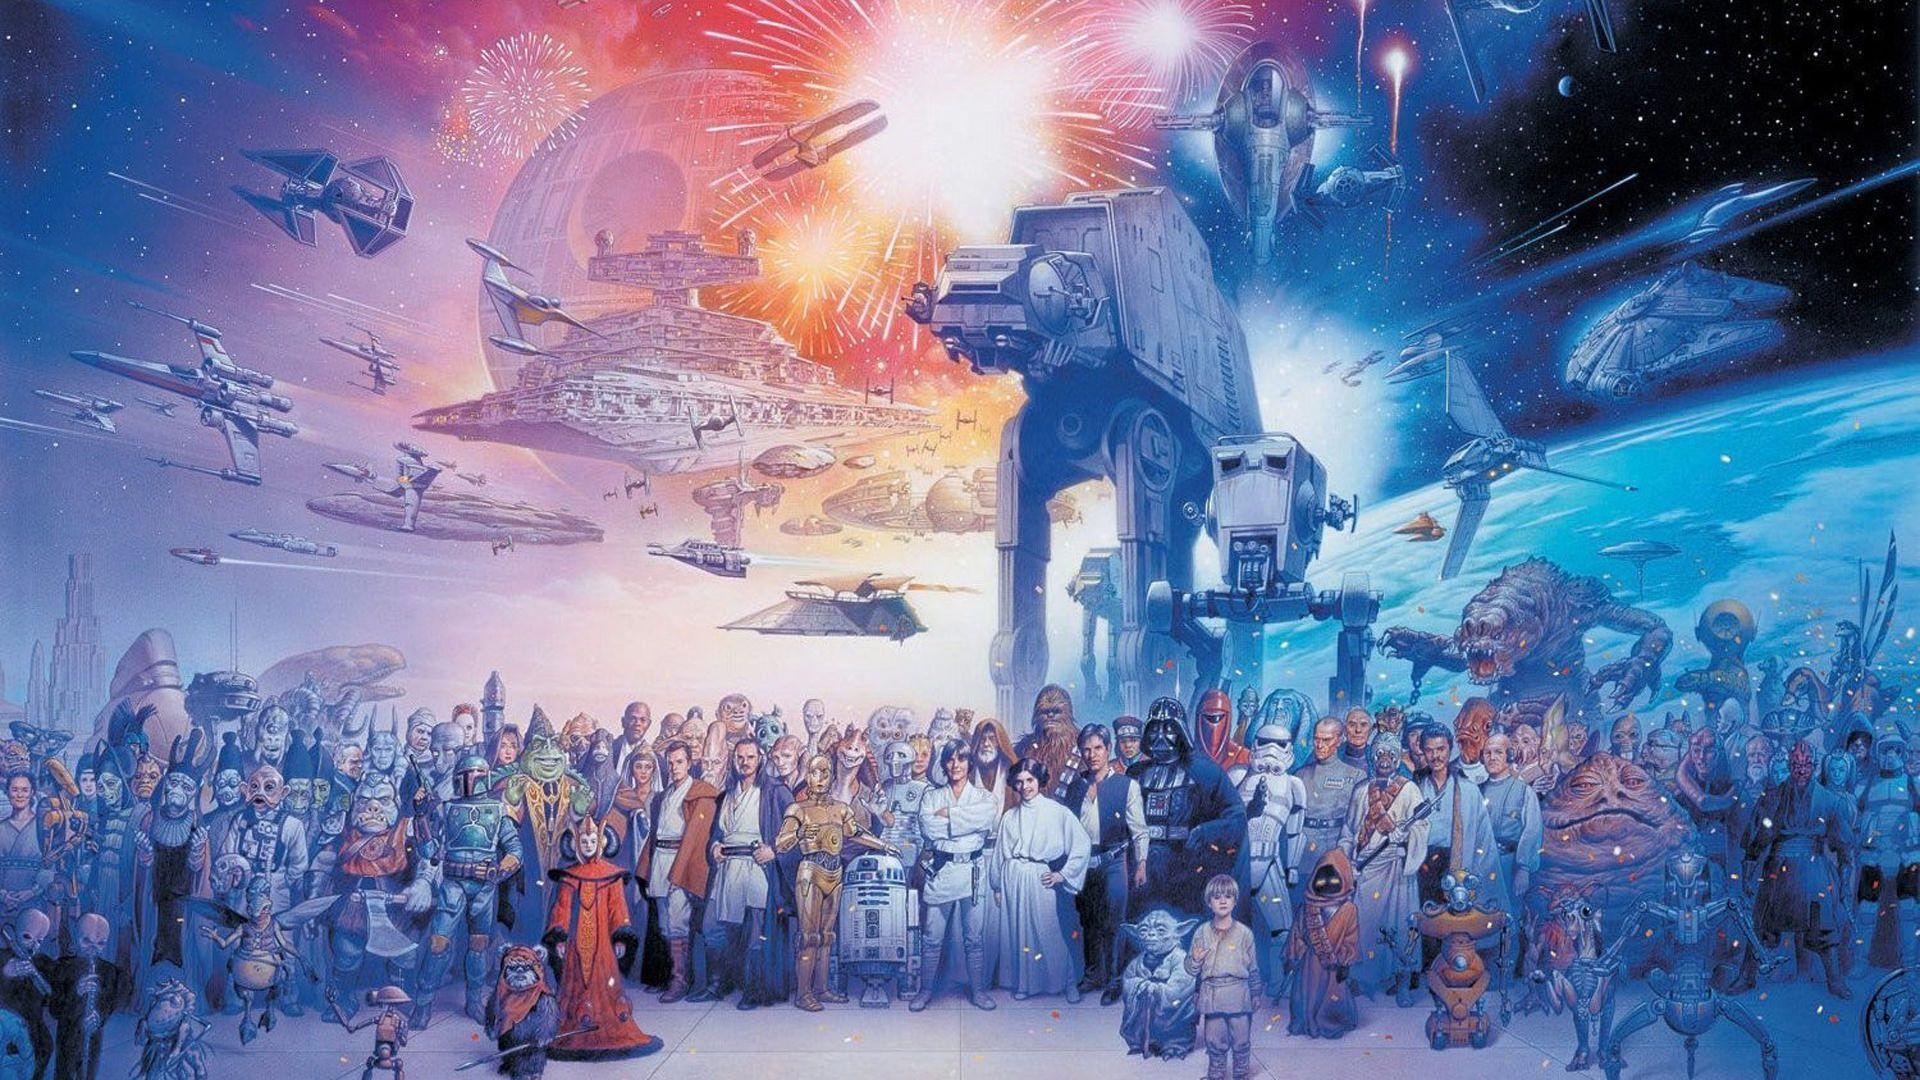 Wallpaper Dump In 2020 Star Wars Wallpaper Galaxy Poster Star Wars Decor